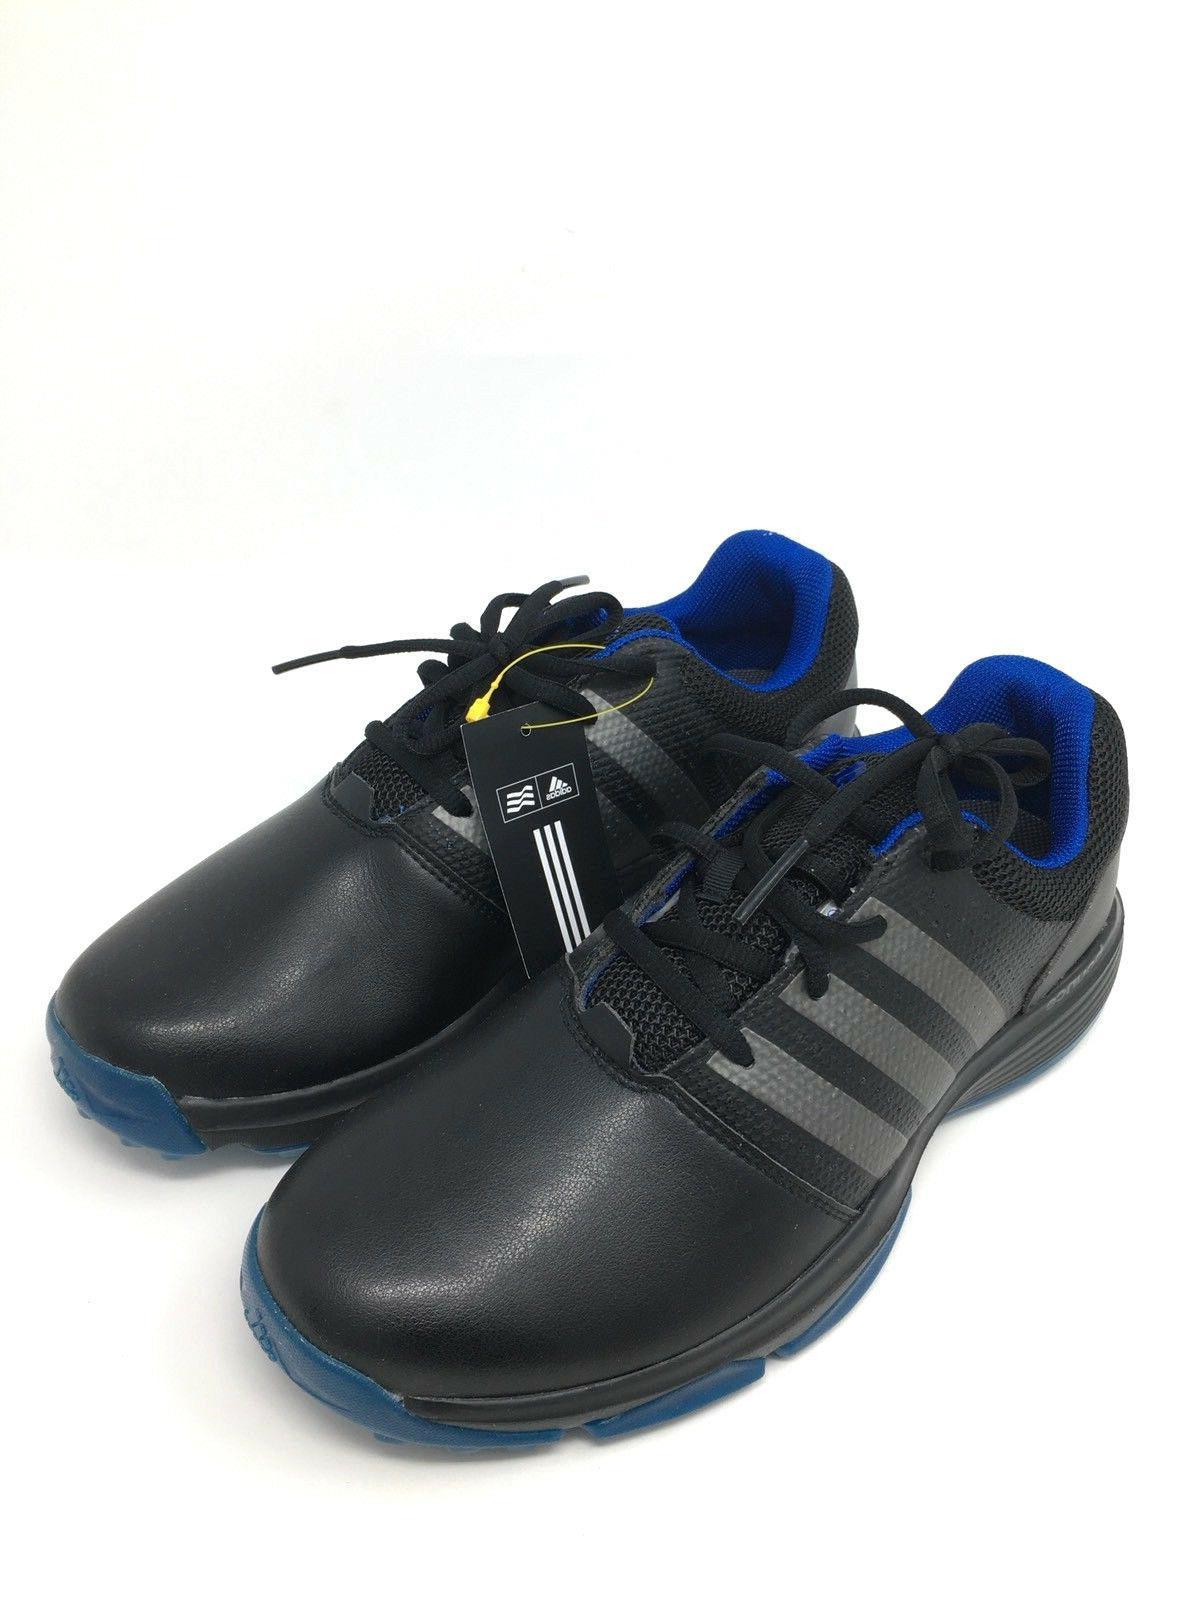 Adidas Traxion Shoes Black 8